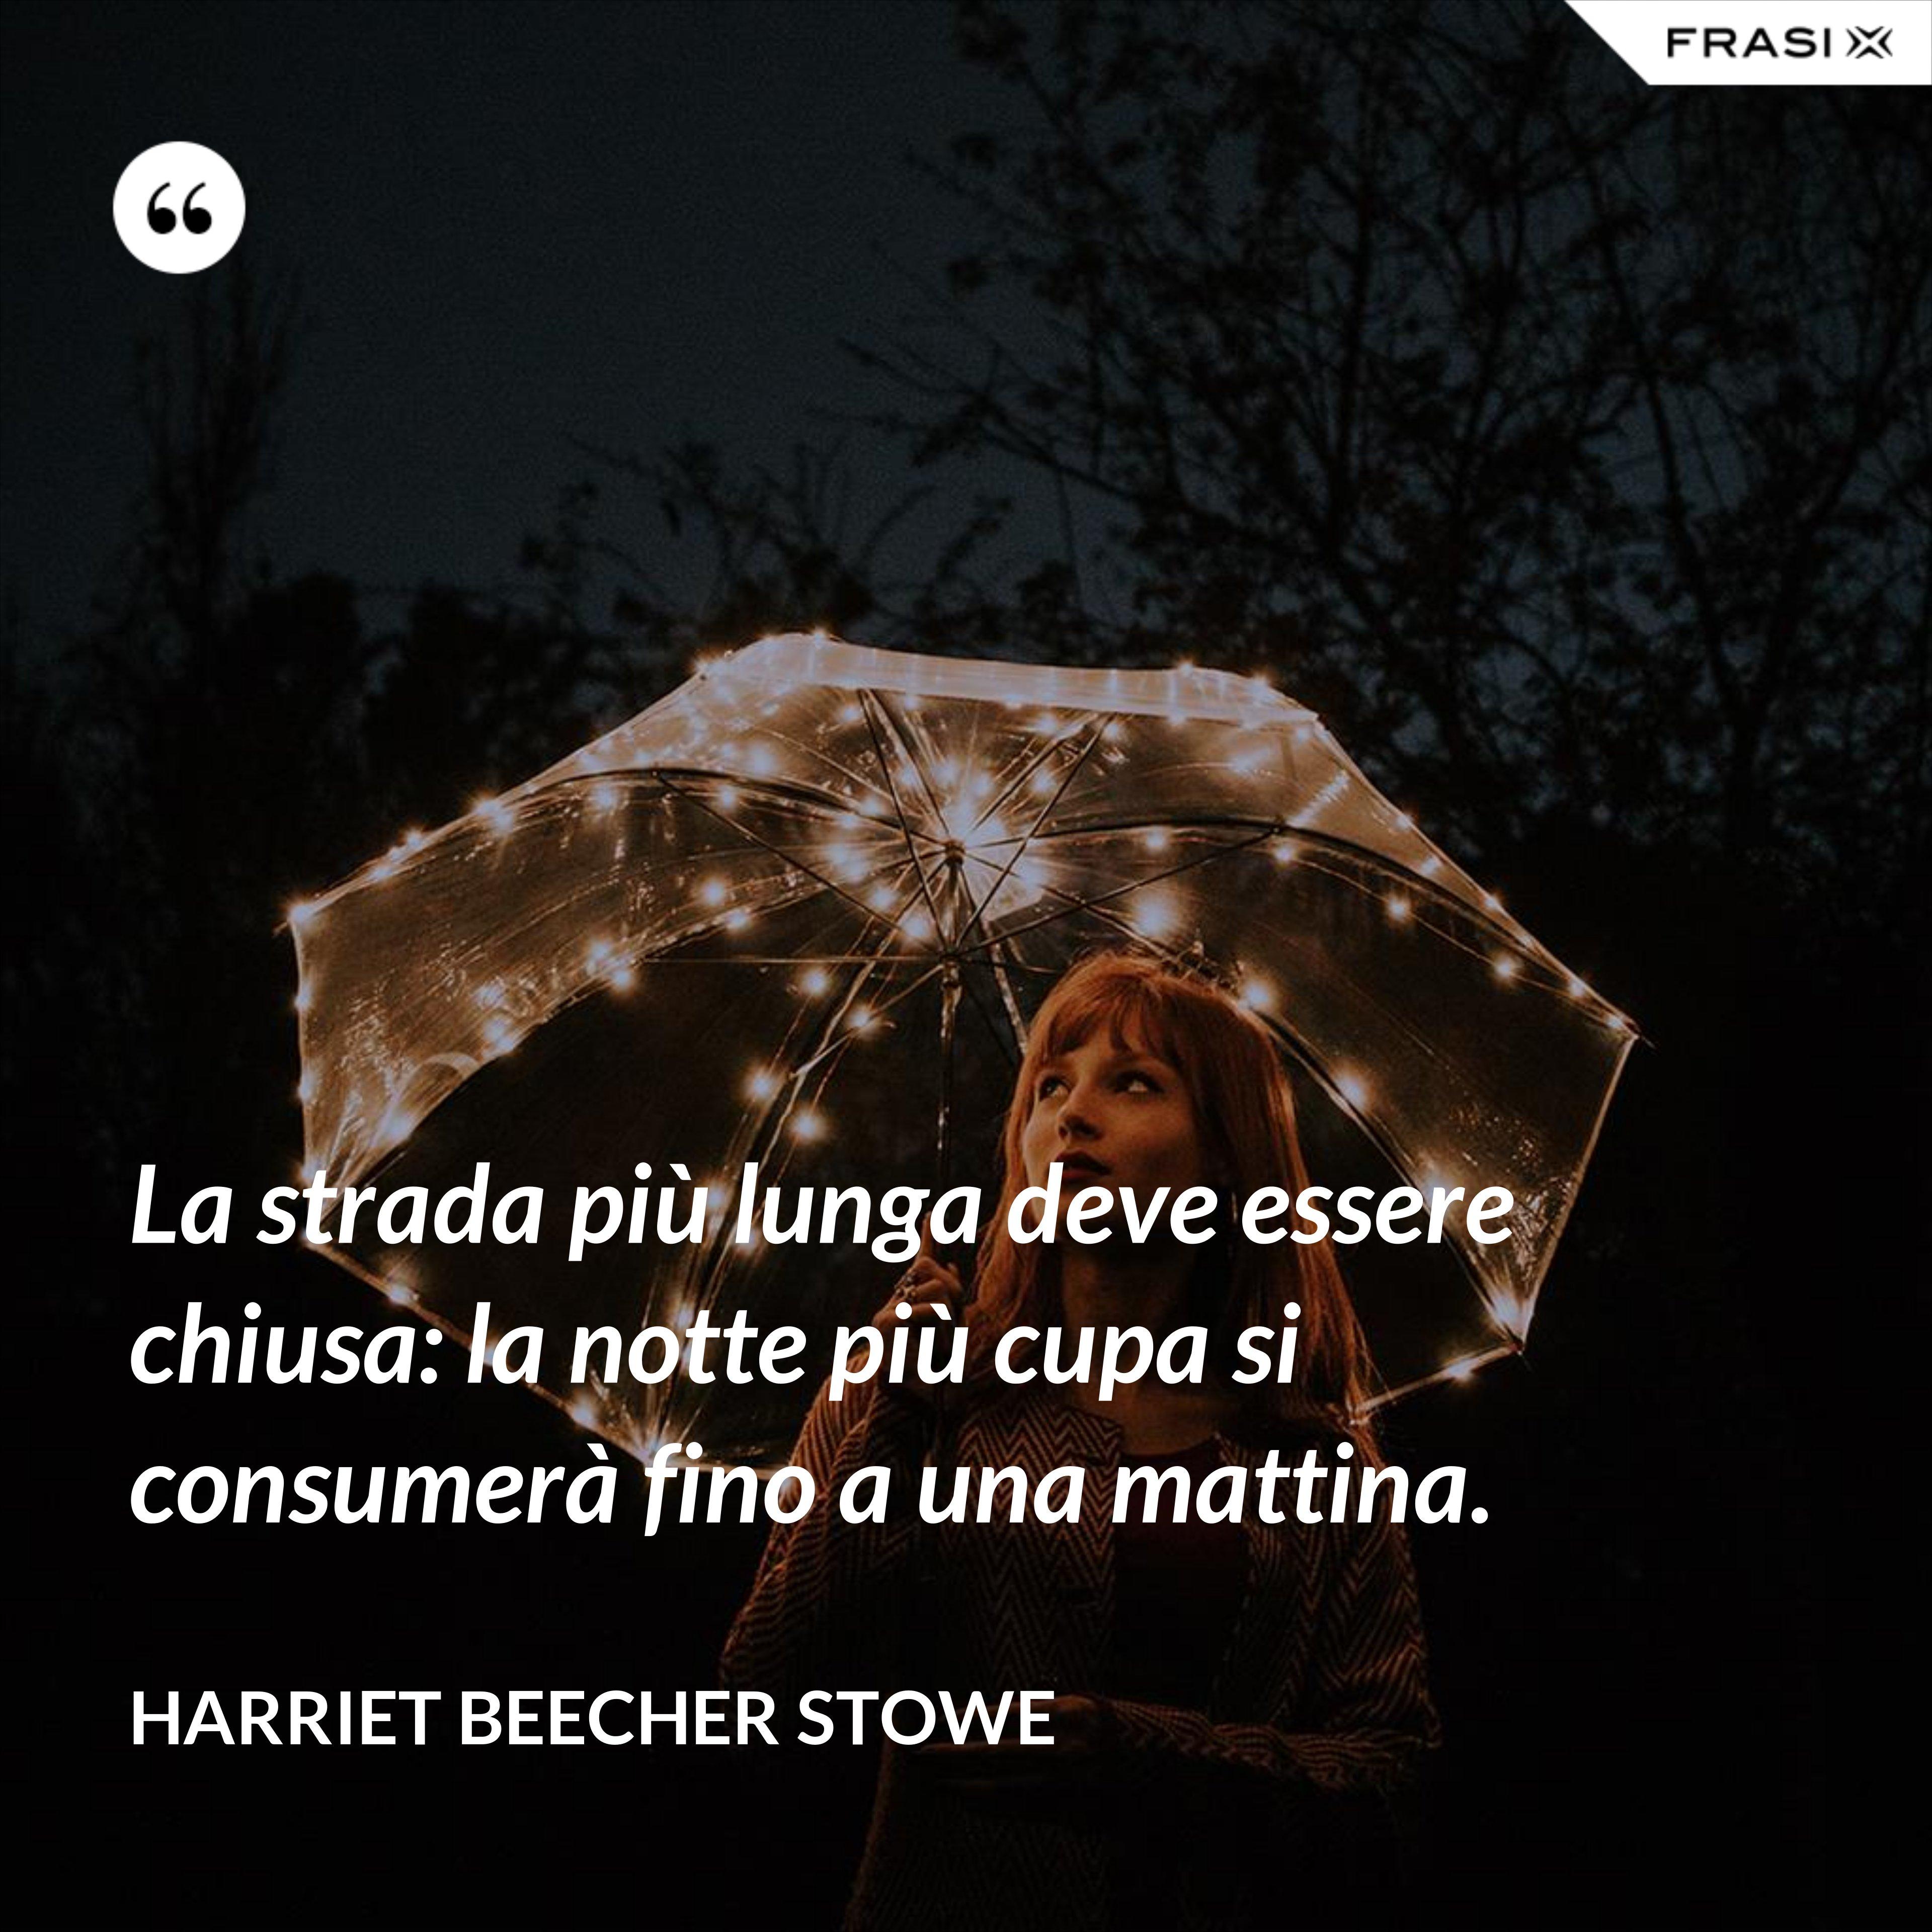 La strada più lunga deve essere chiusa: la notte più cupa si consumerà fino a una mattina. - Harriet Beecher Stowe